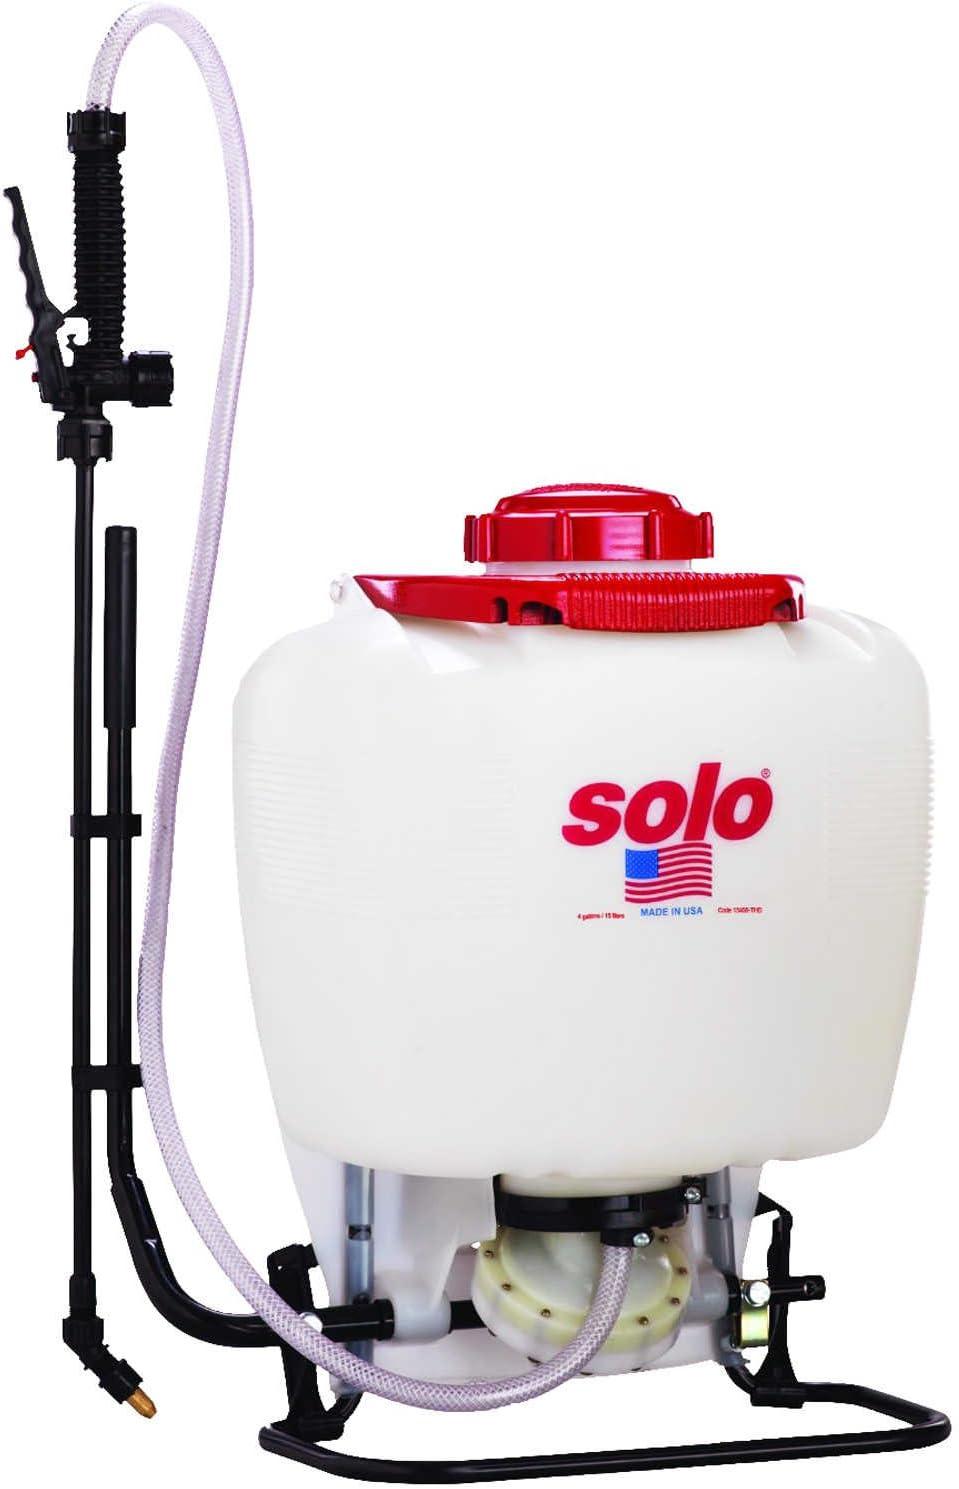 Solo 475-101 Backpack Sprayer, 4 Gallon